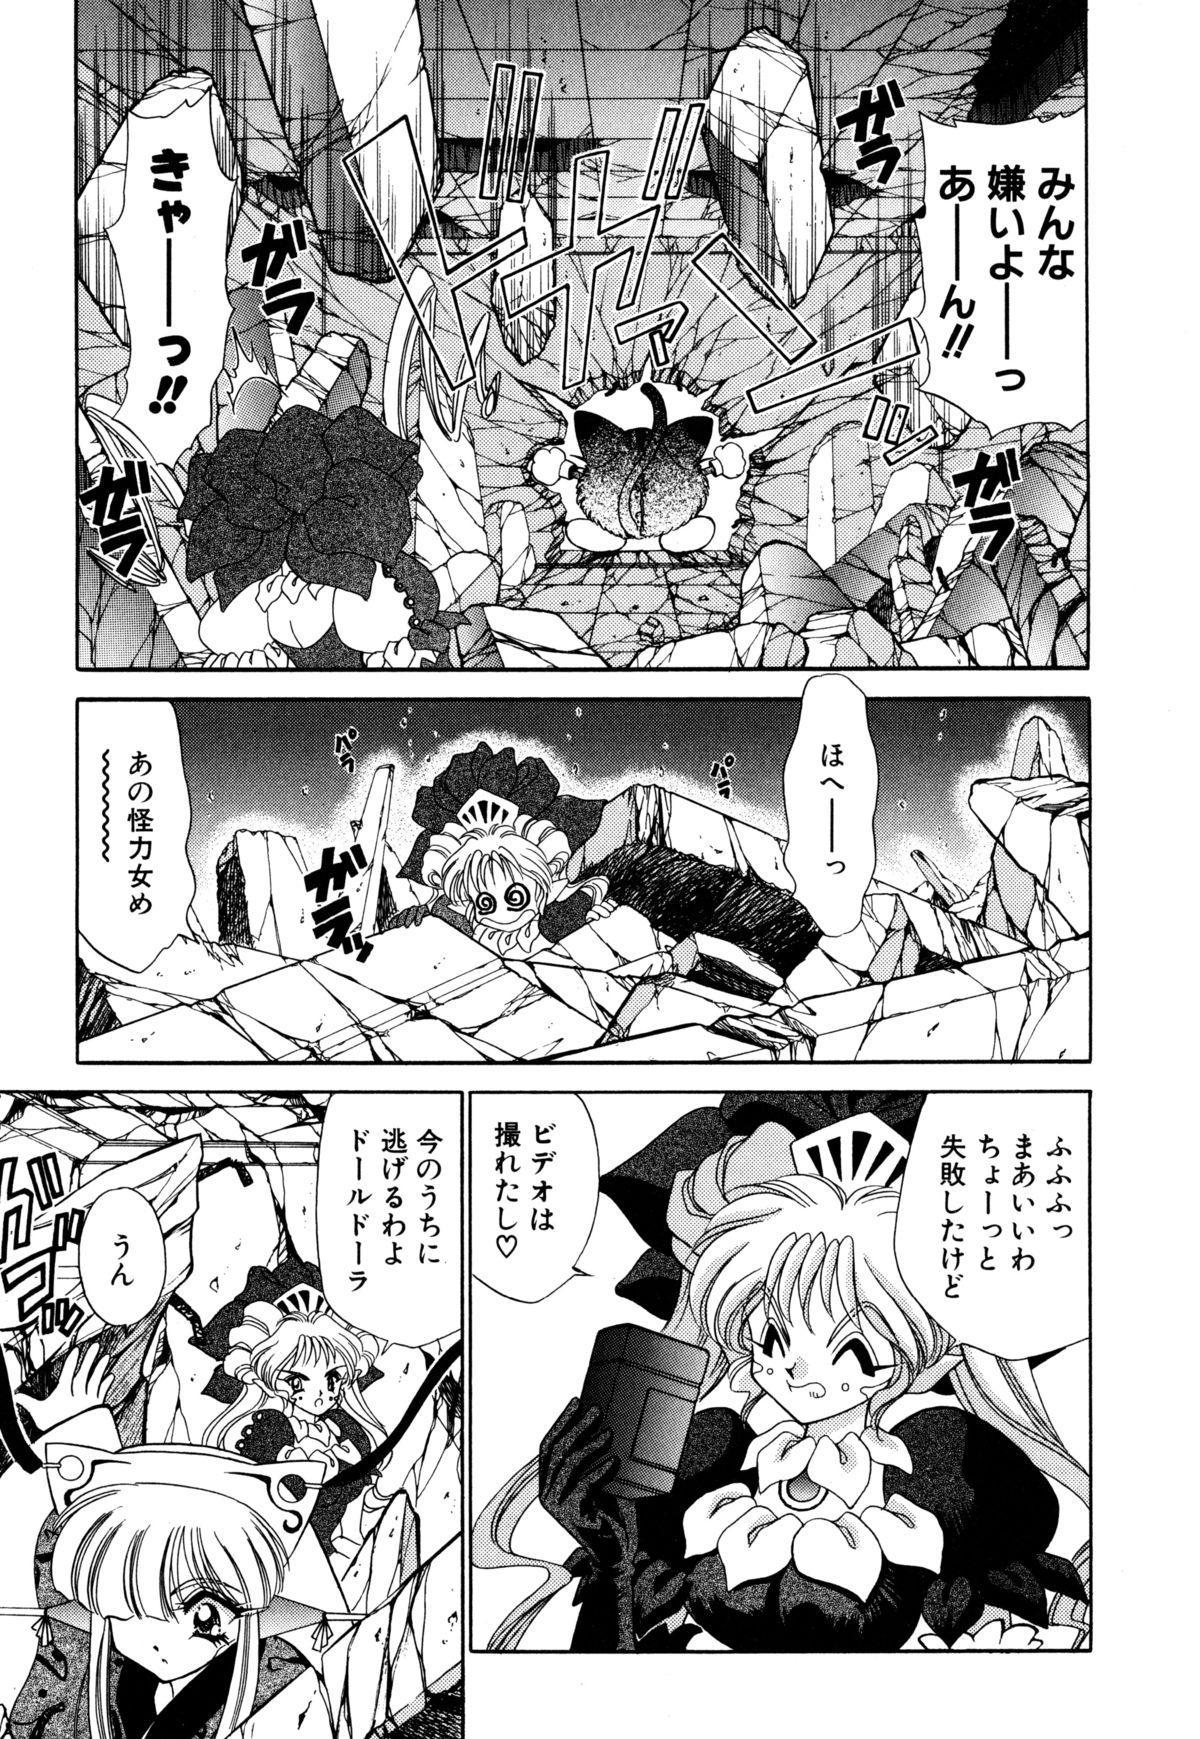 Kigurumi Sentai Quiltian 135